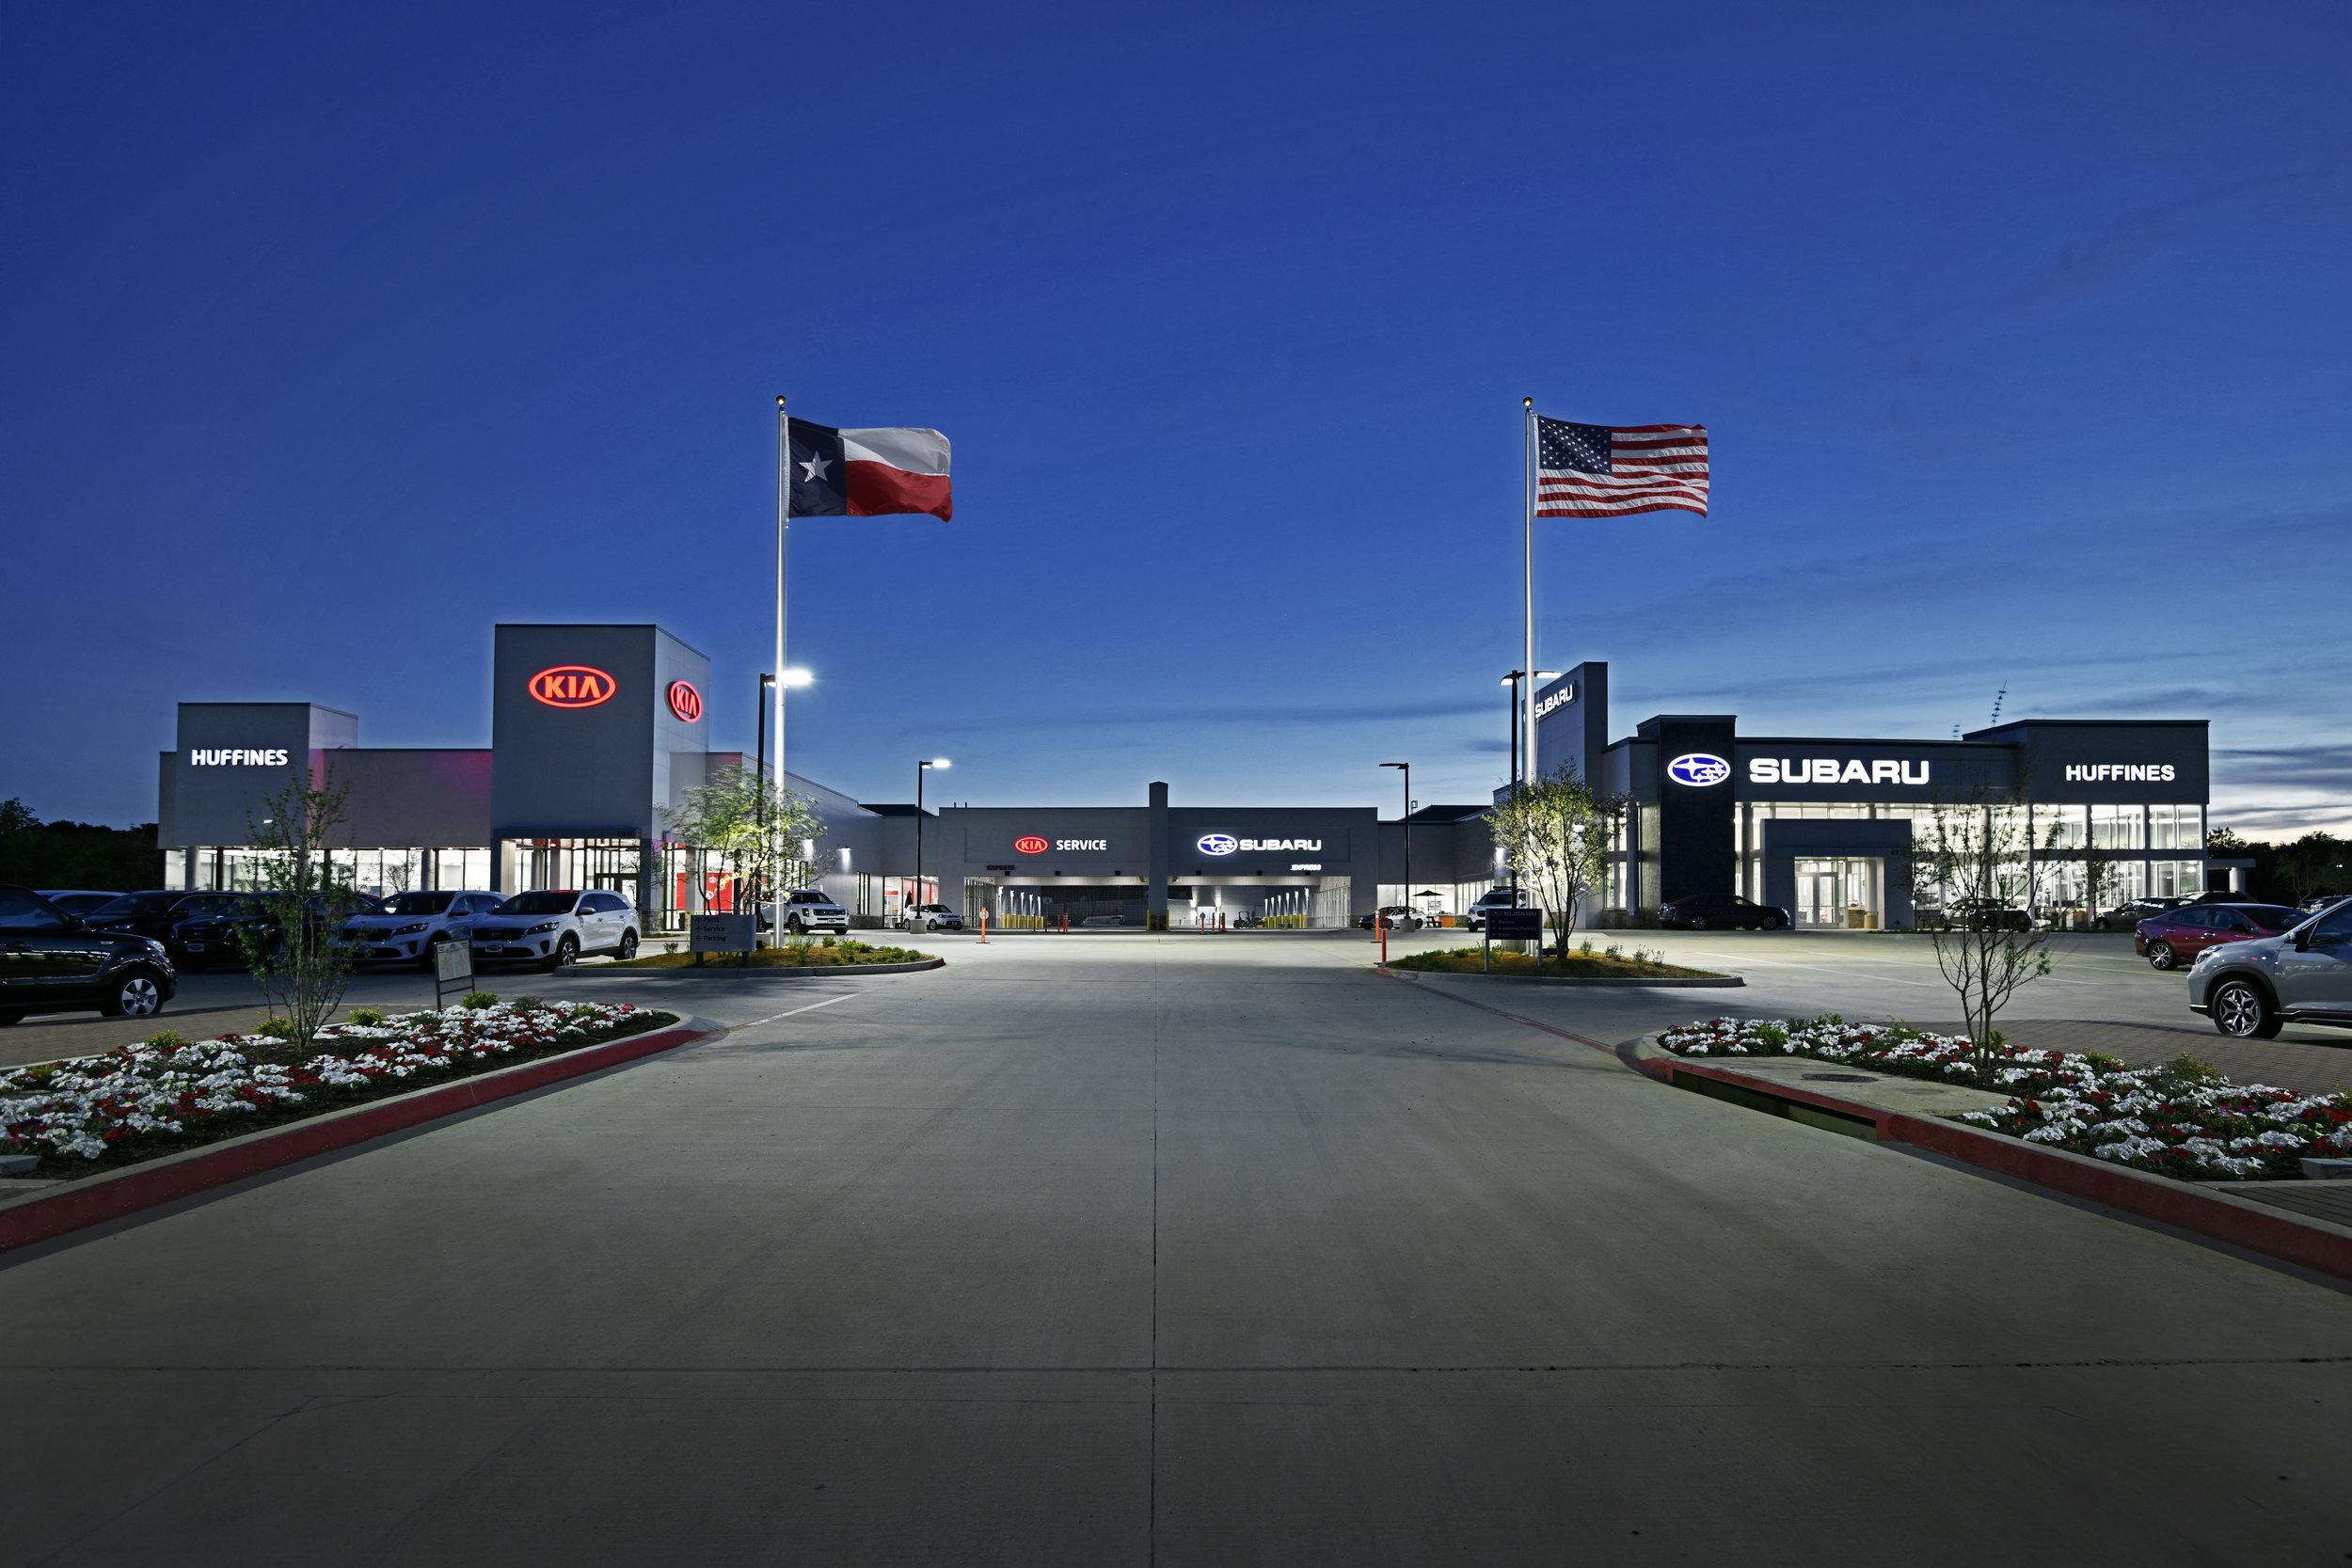 Huffines Kia Subaru, Corinth, TX